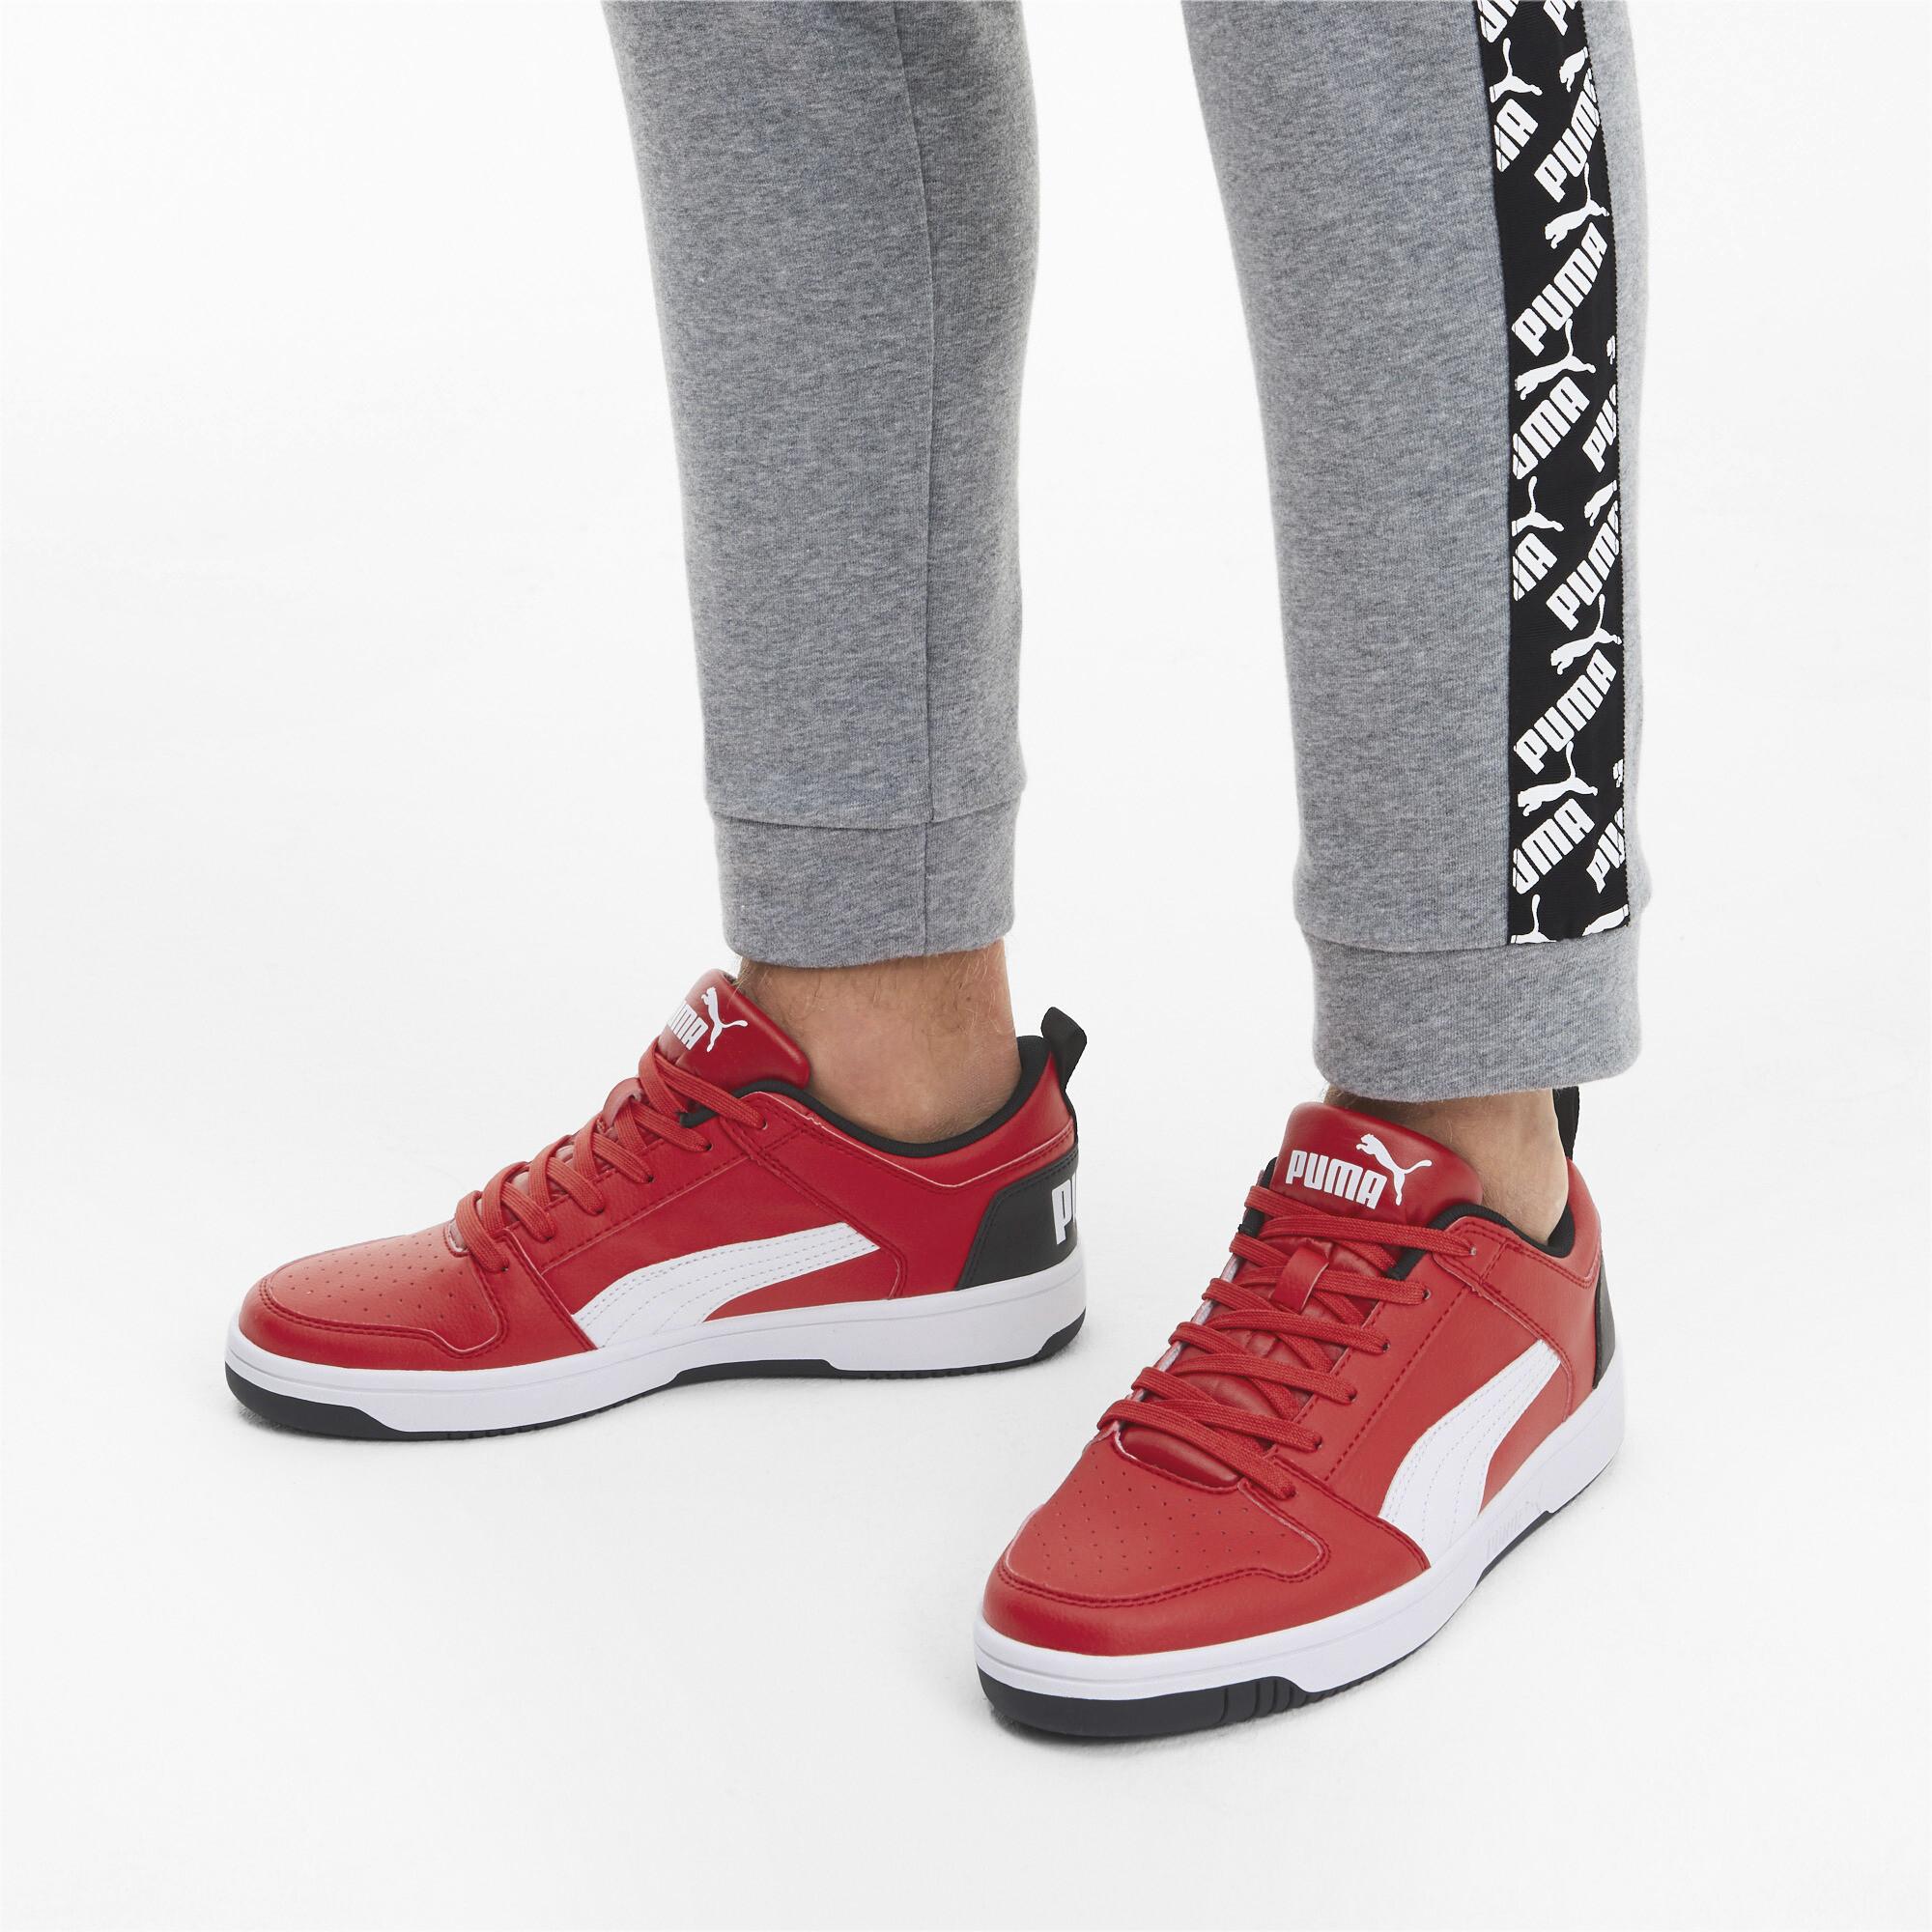 PUMA-PUMA-Rebound-LayUp-Lo-Men-039-s-Sneakers-Men-Shoe-Basics miniatura 19